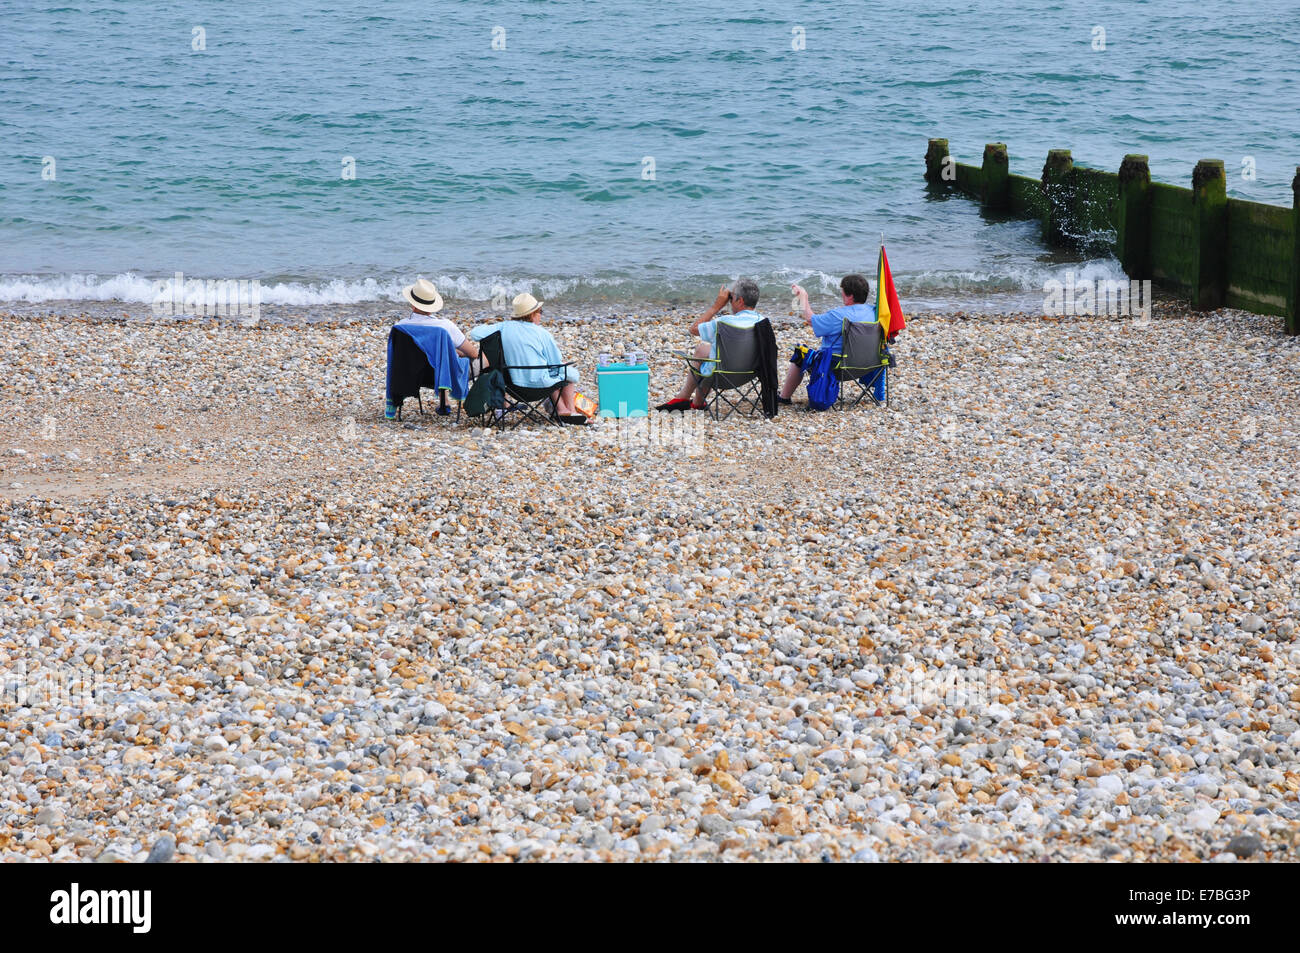 four people sitting on stony beach overlooking the sea. - Stock Image